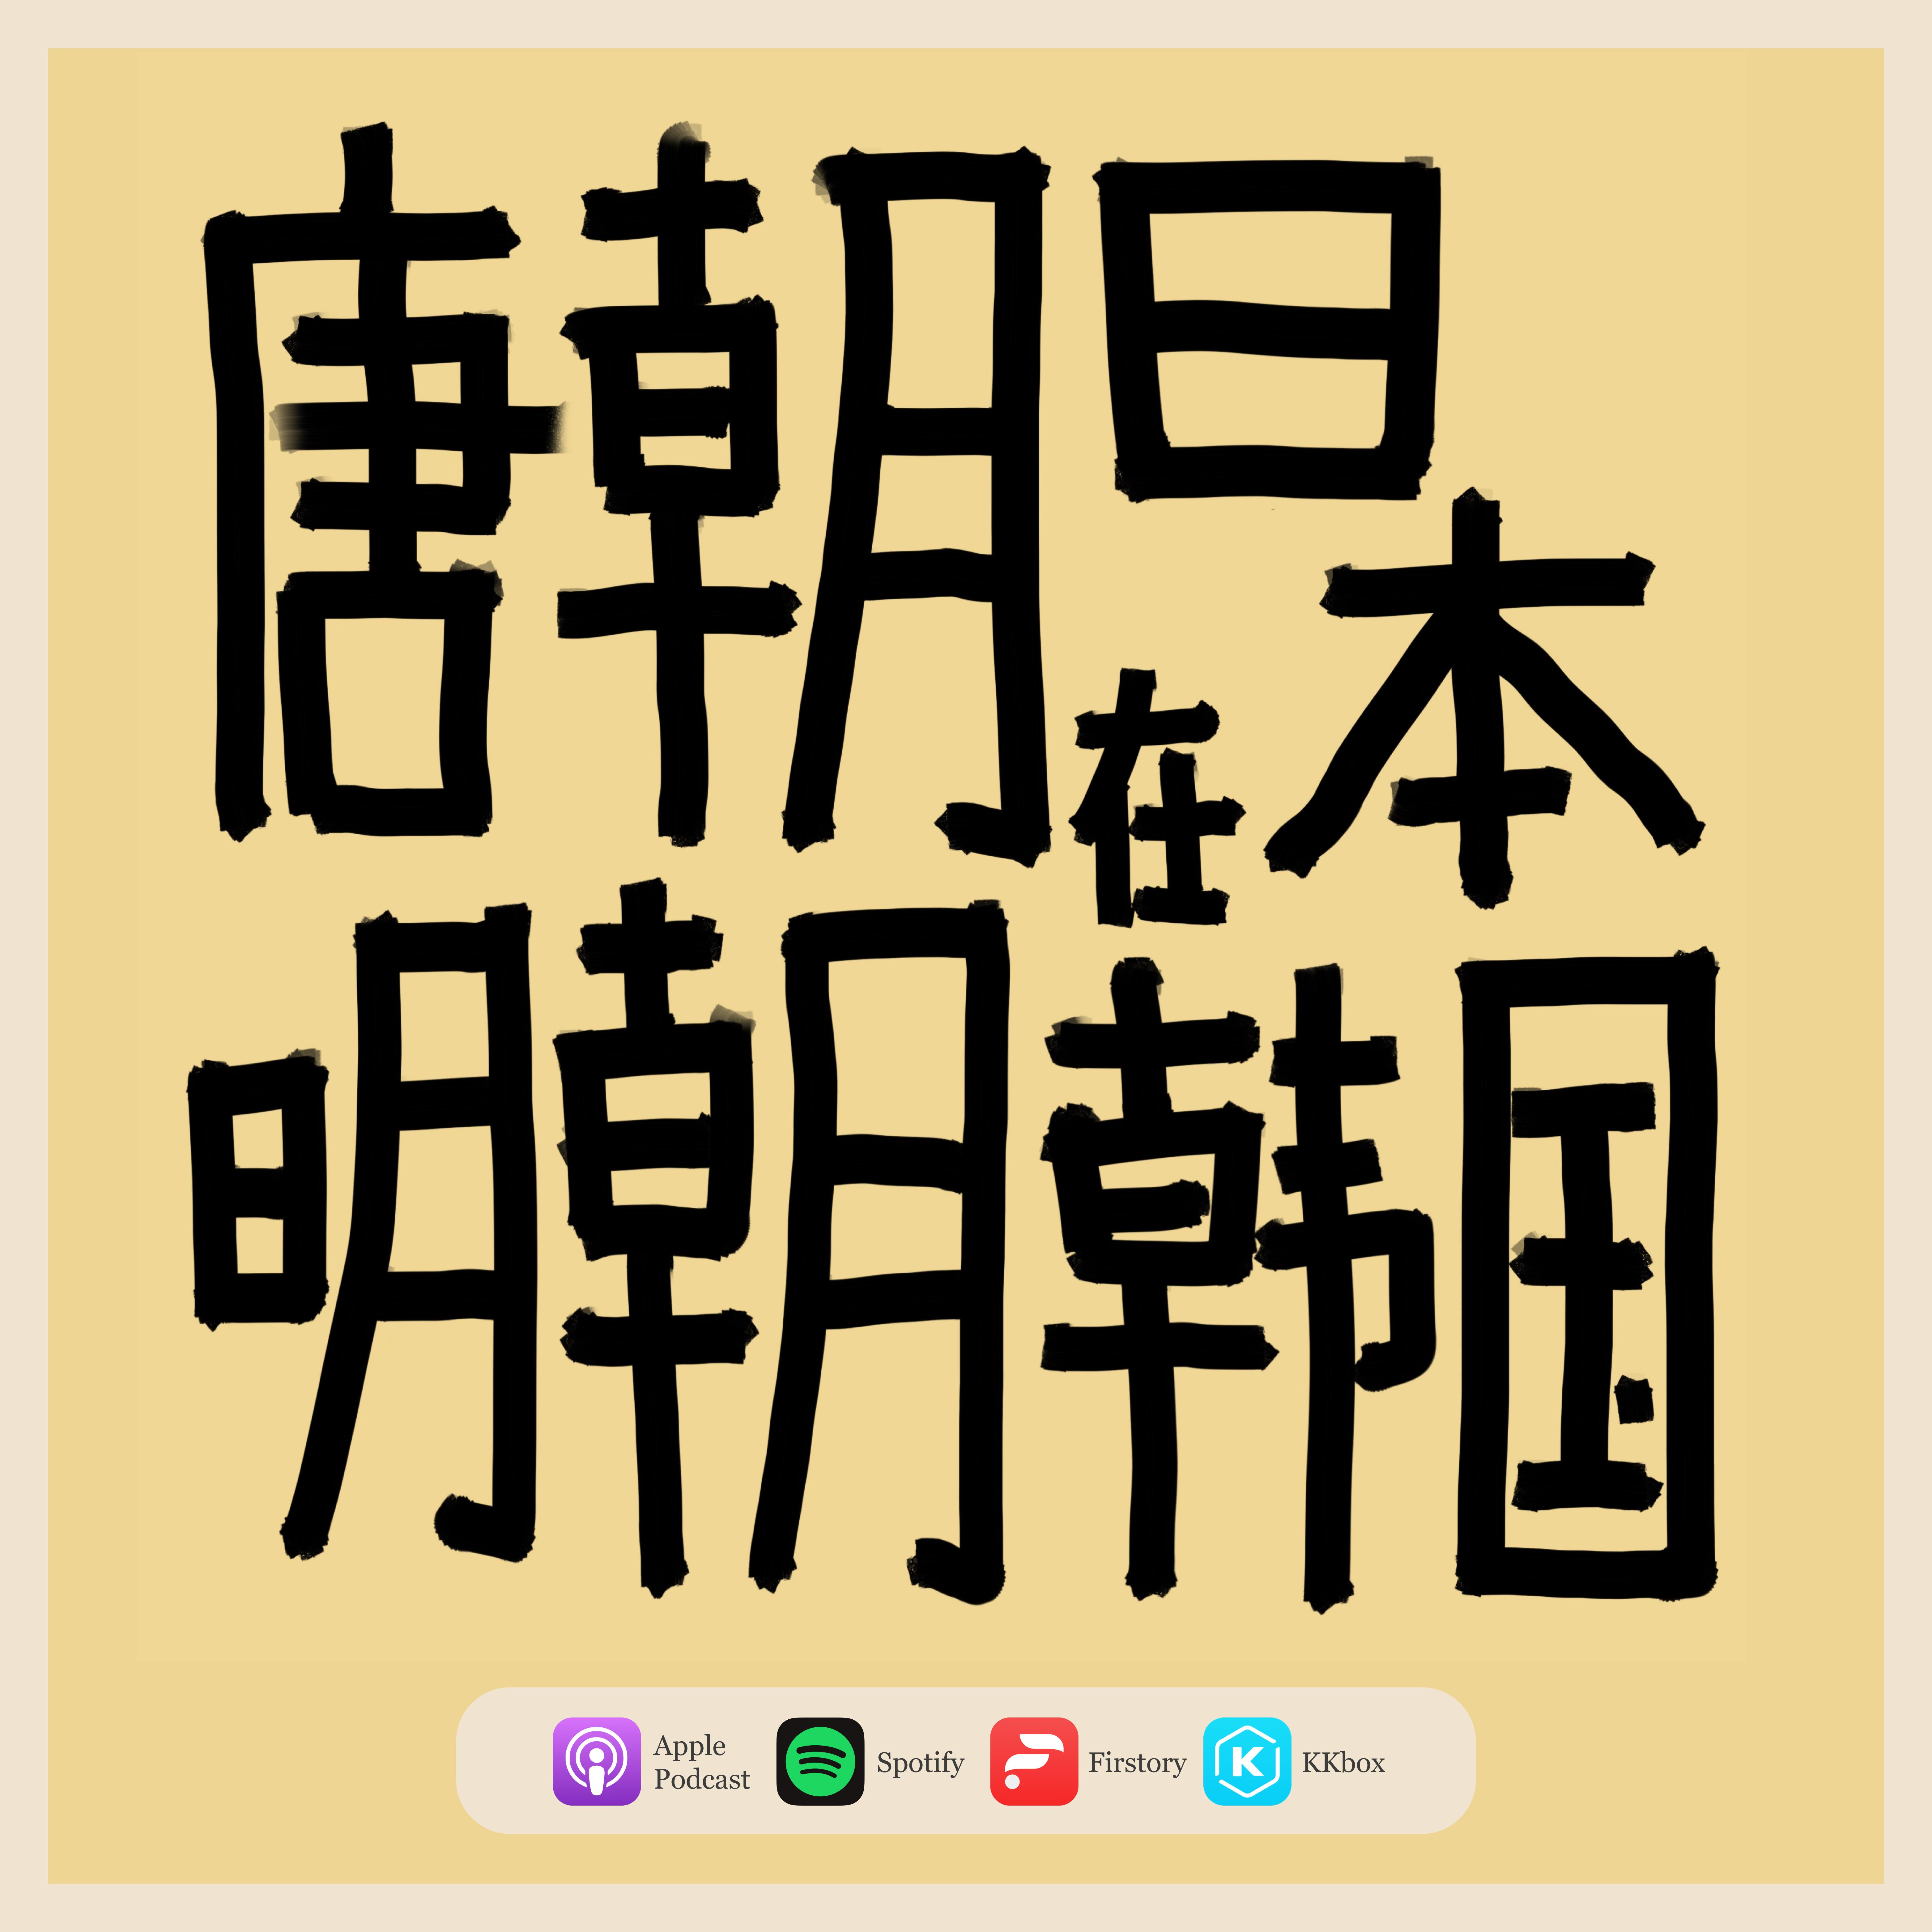 S1E9 - 唐朝在日本,明朝在韩国!?